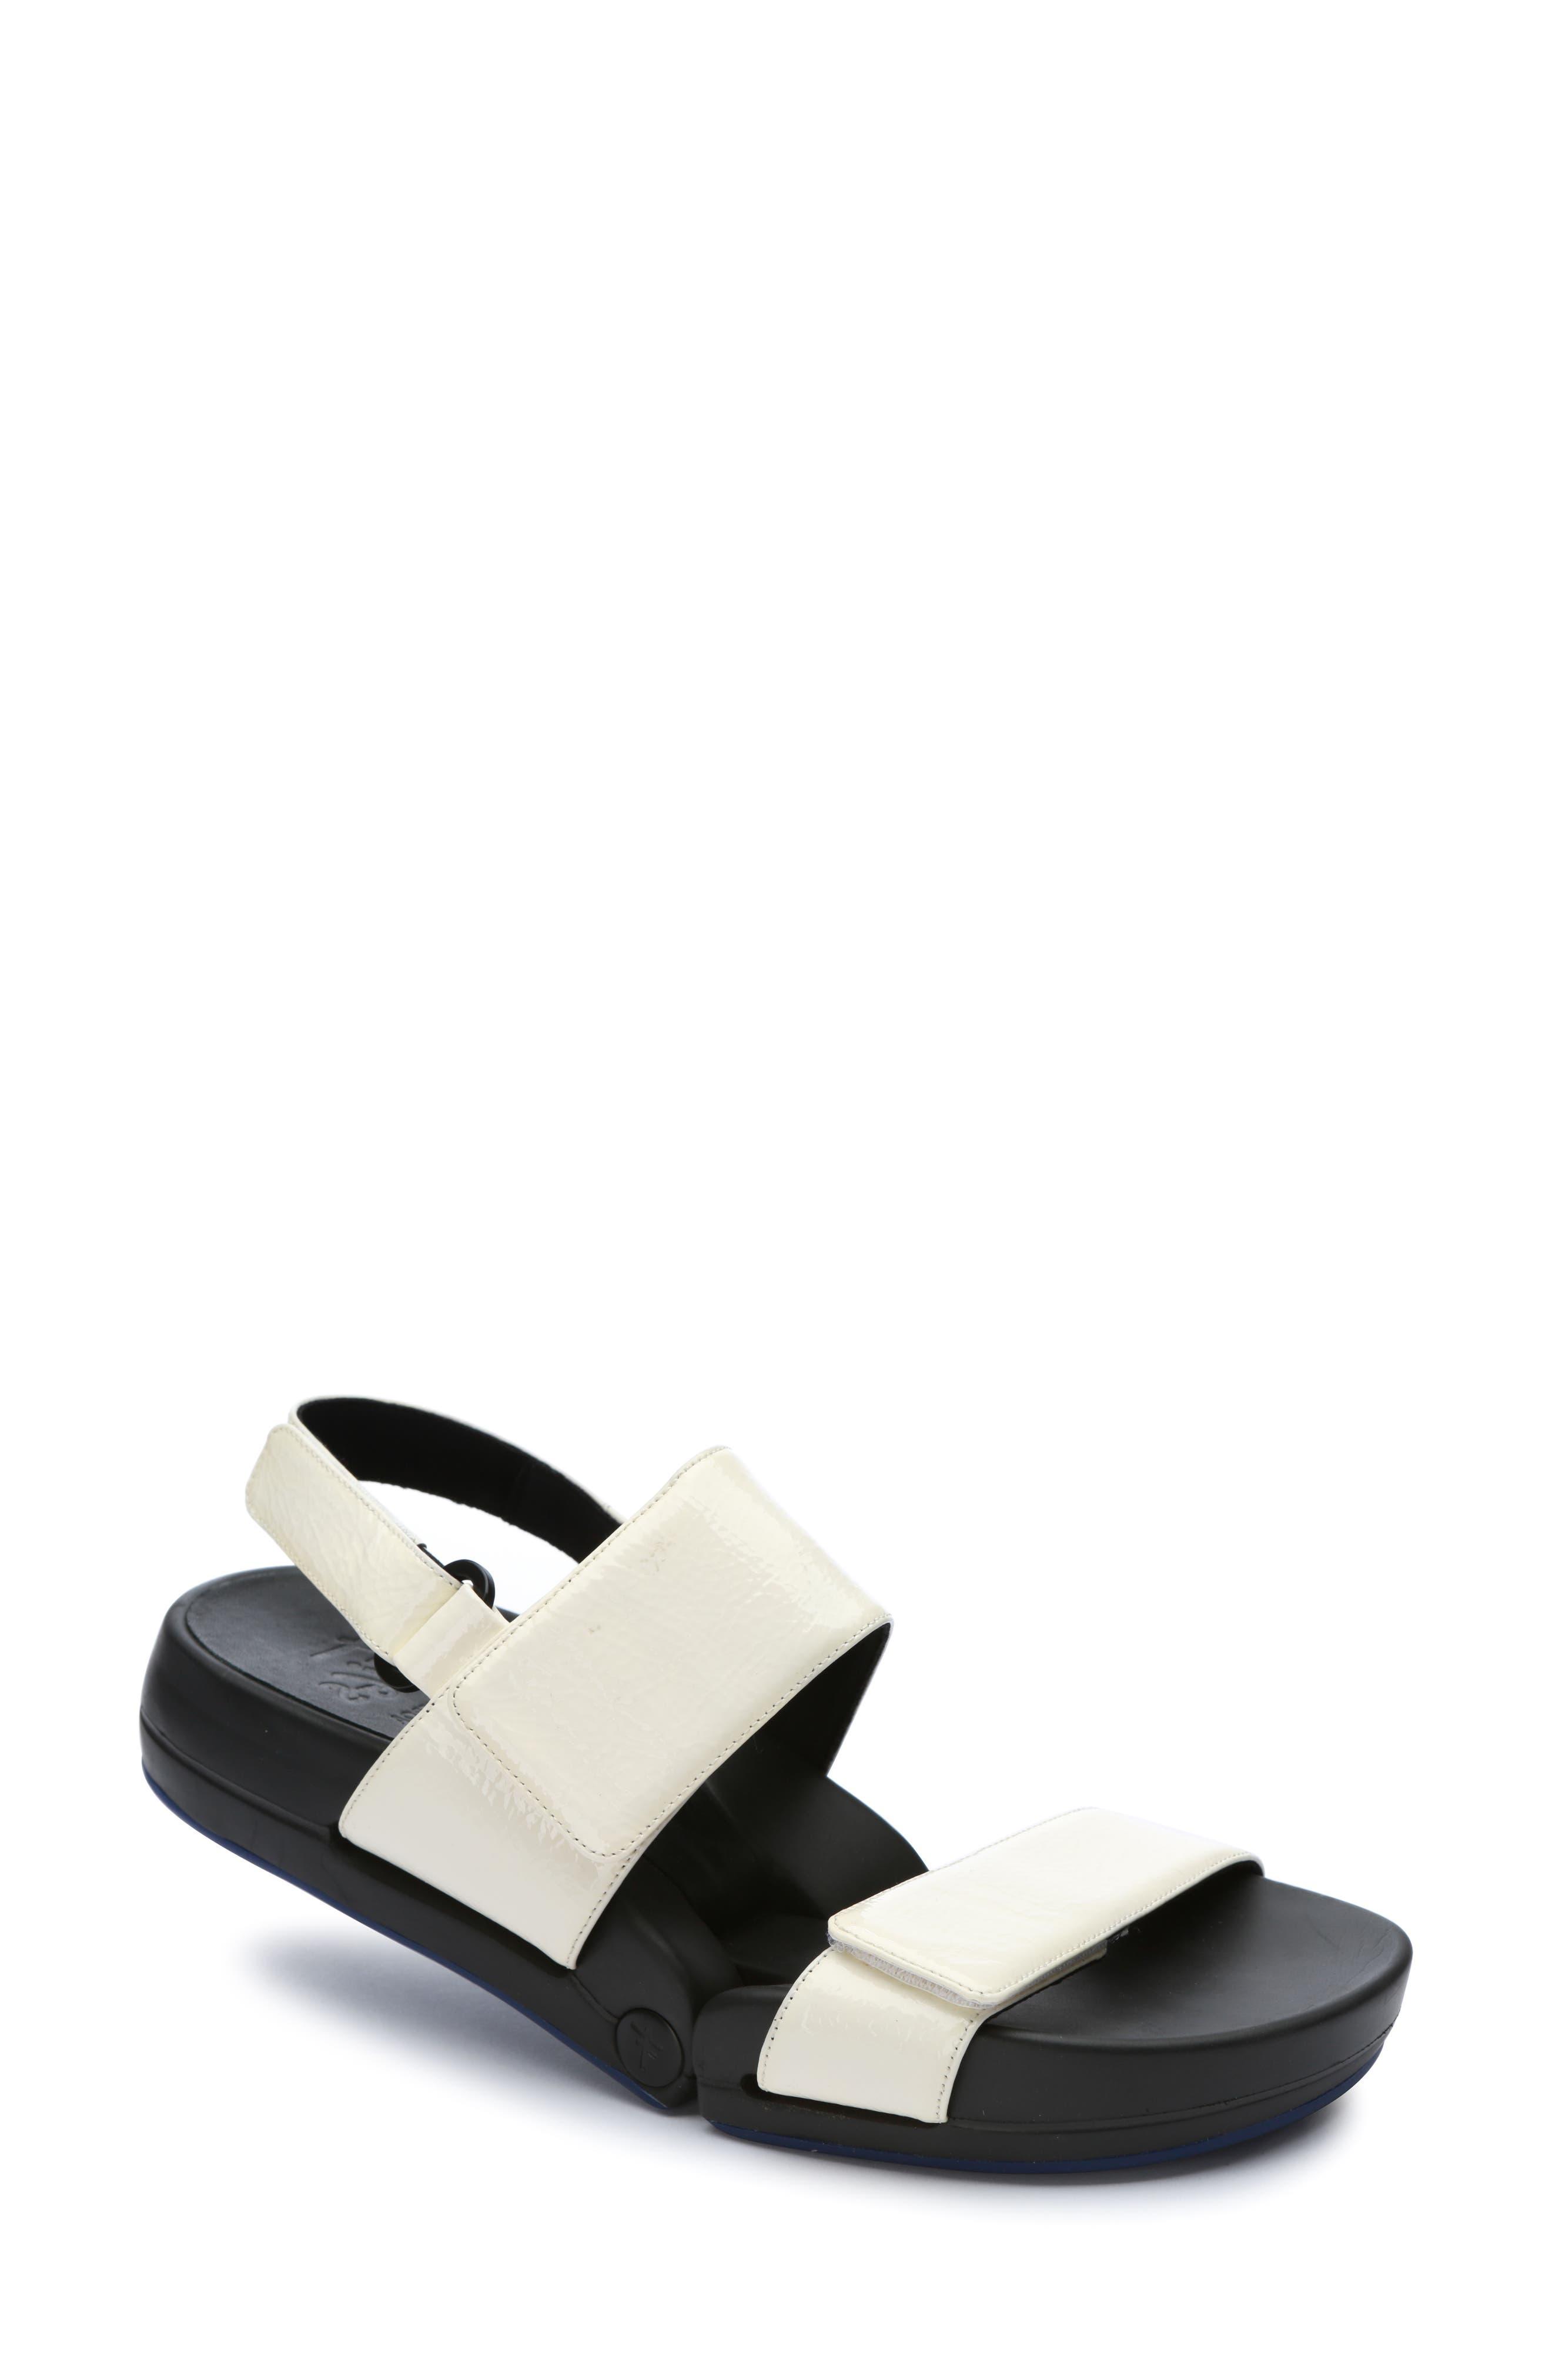 Figulous Sandal,                             Main thumbnail 1, color,                             White Crinkle Patent Leather